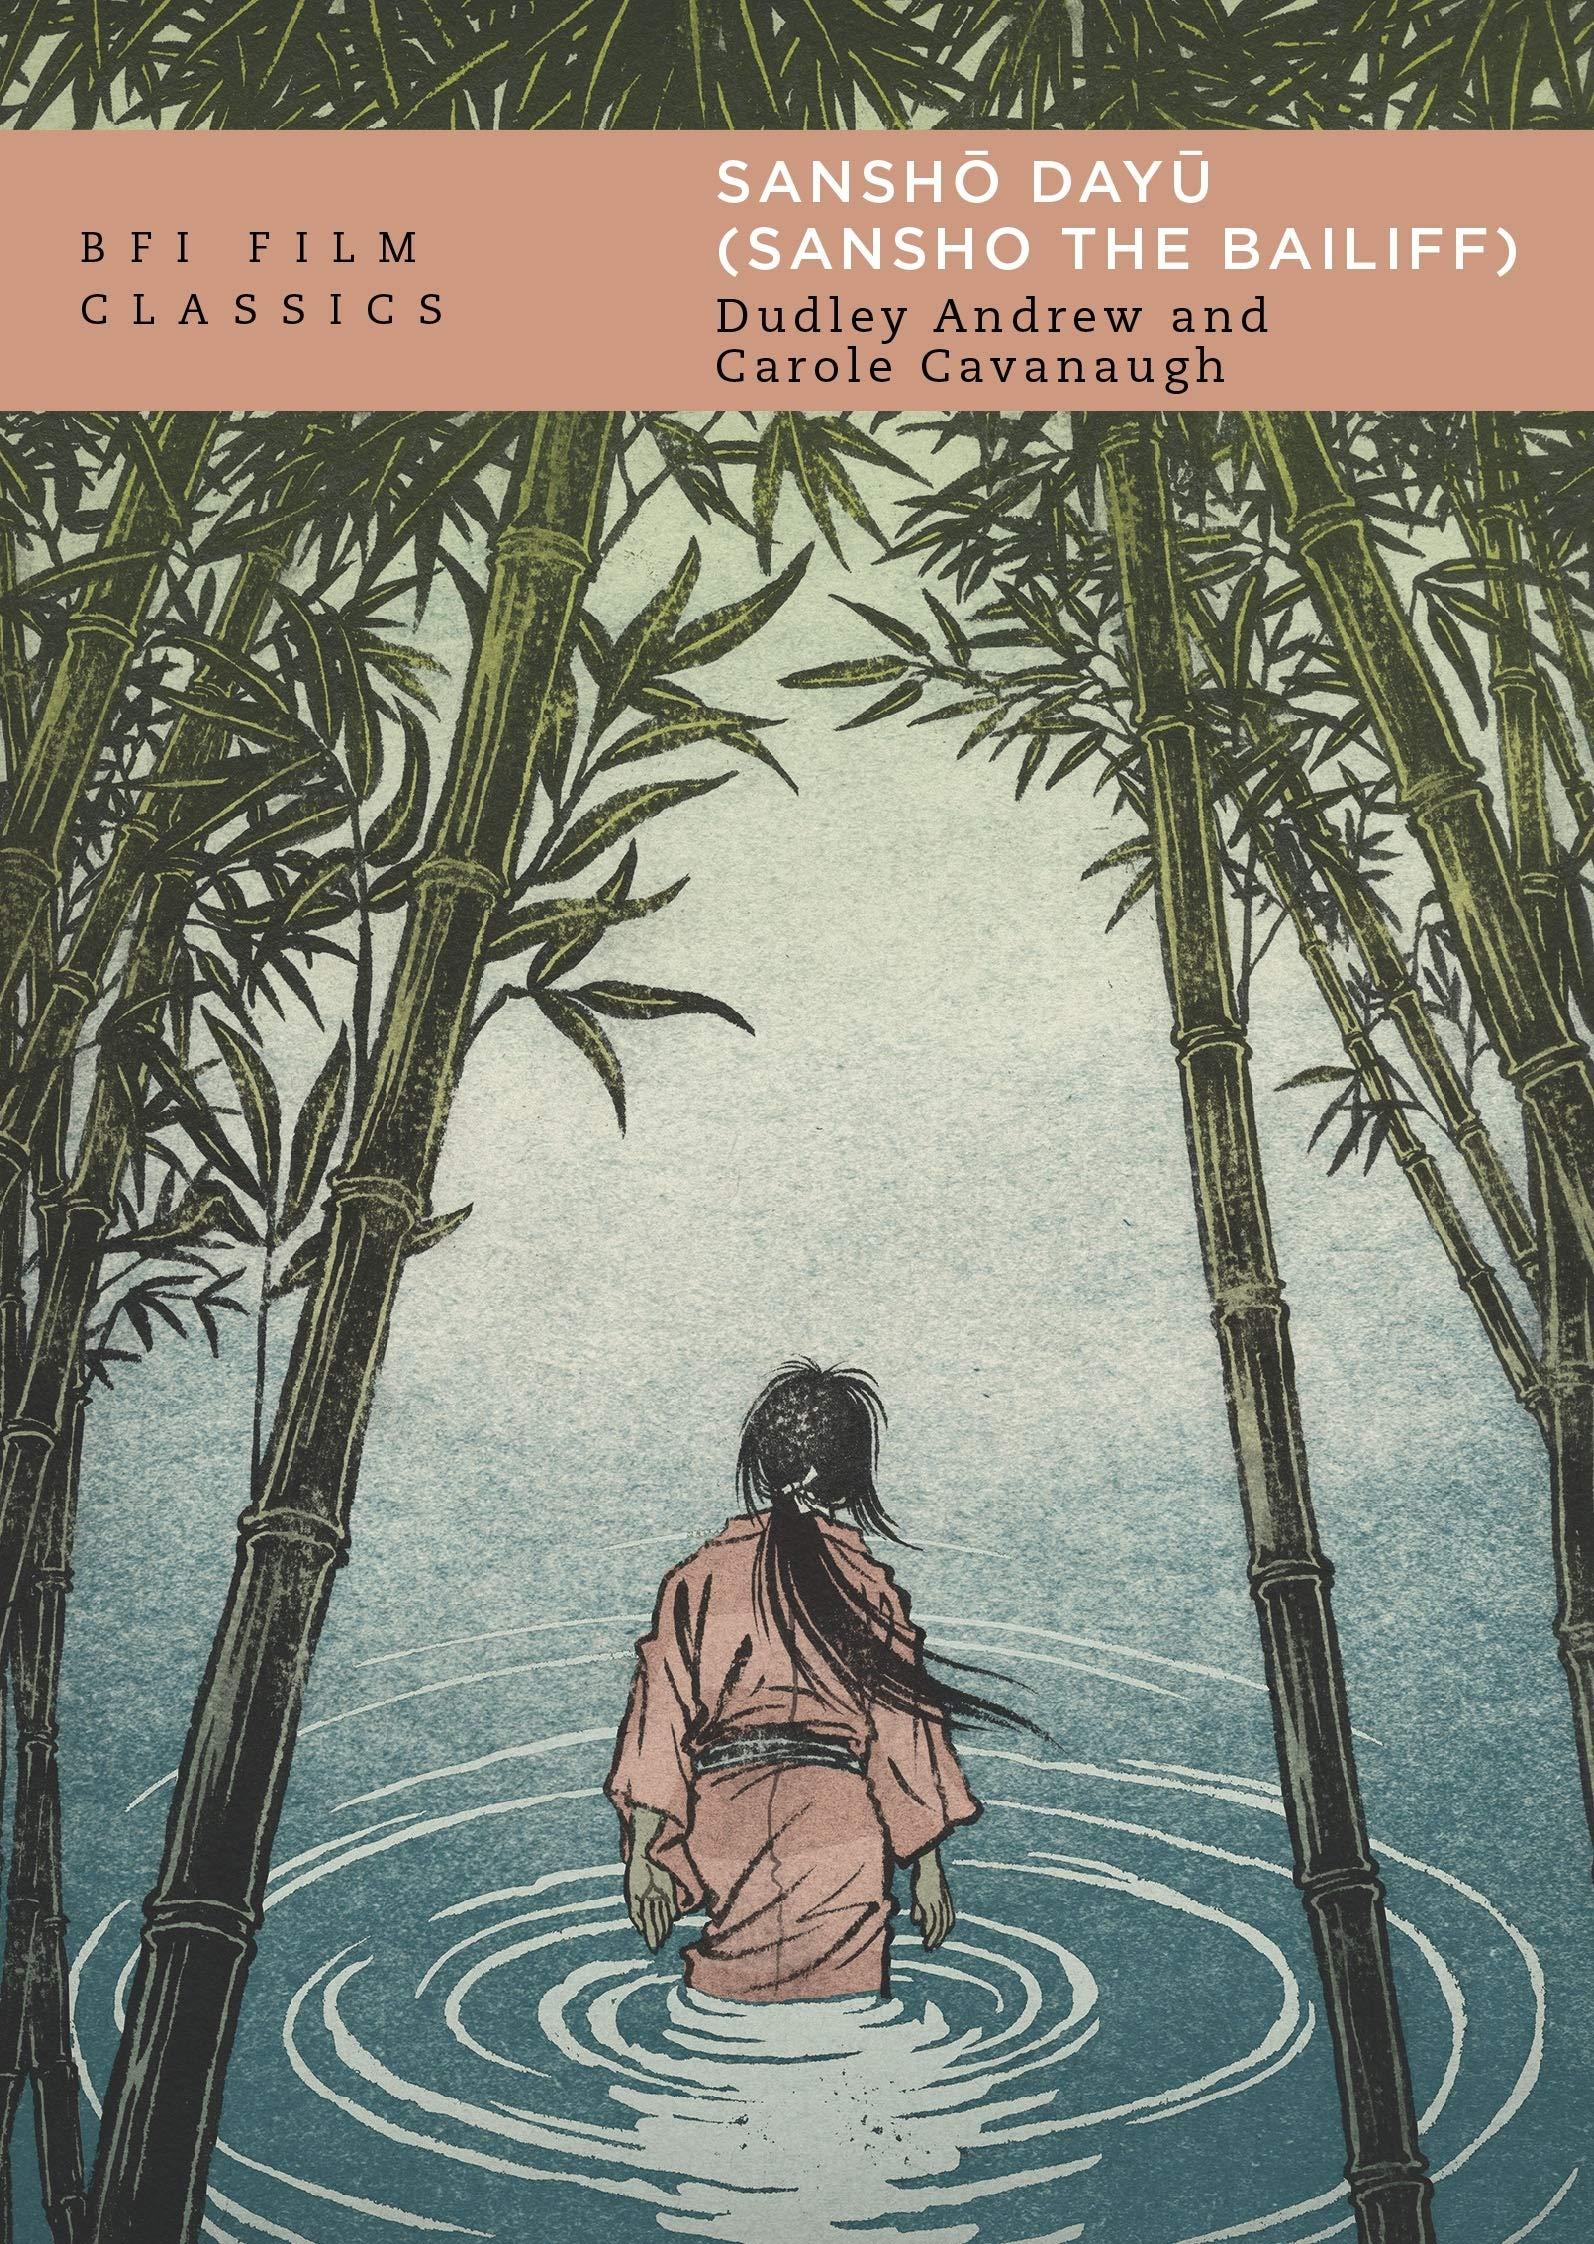 Buy Sanshô Dayû (Sansho the Bailiff): BFI Film Classics